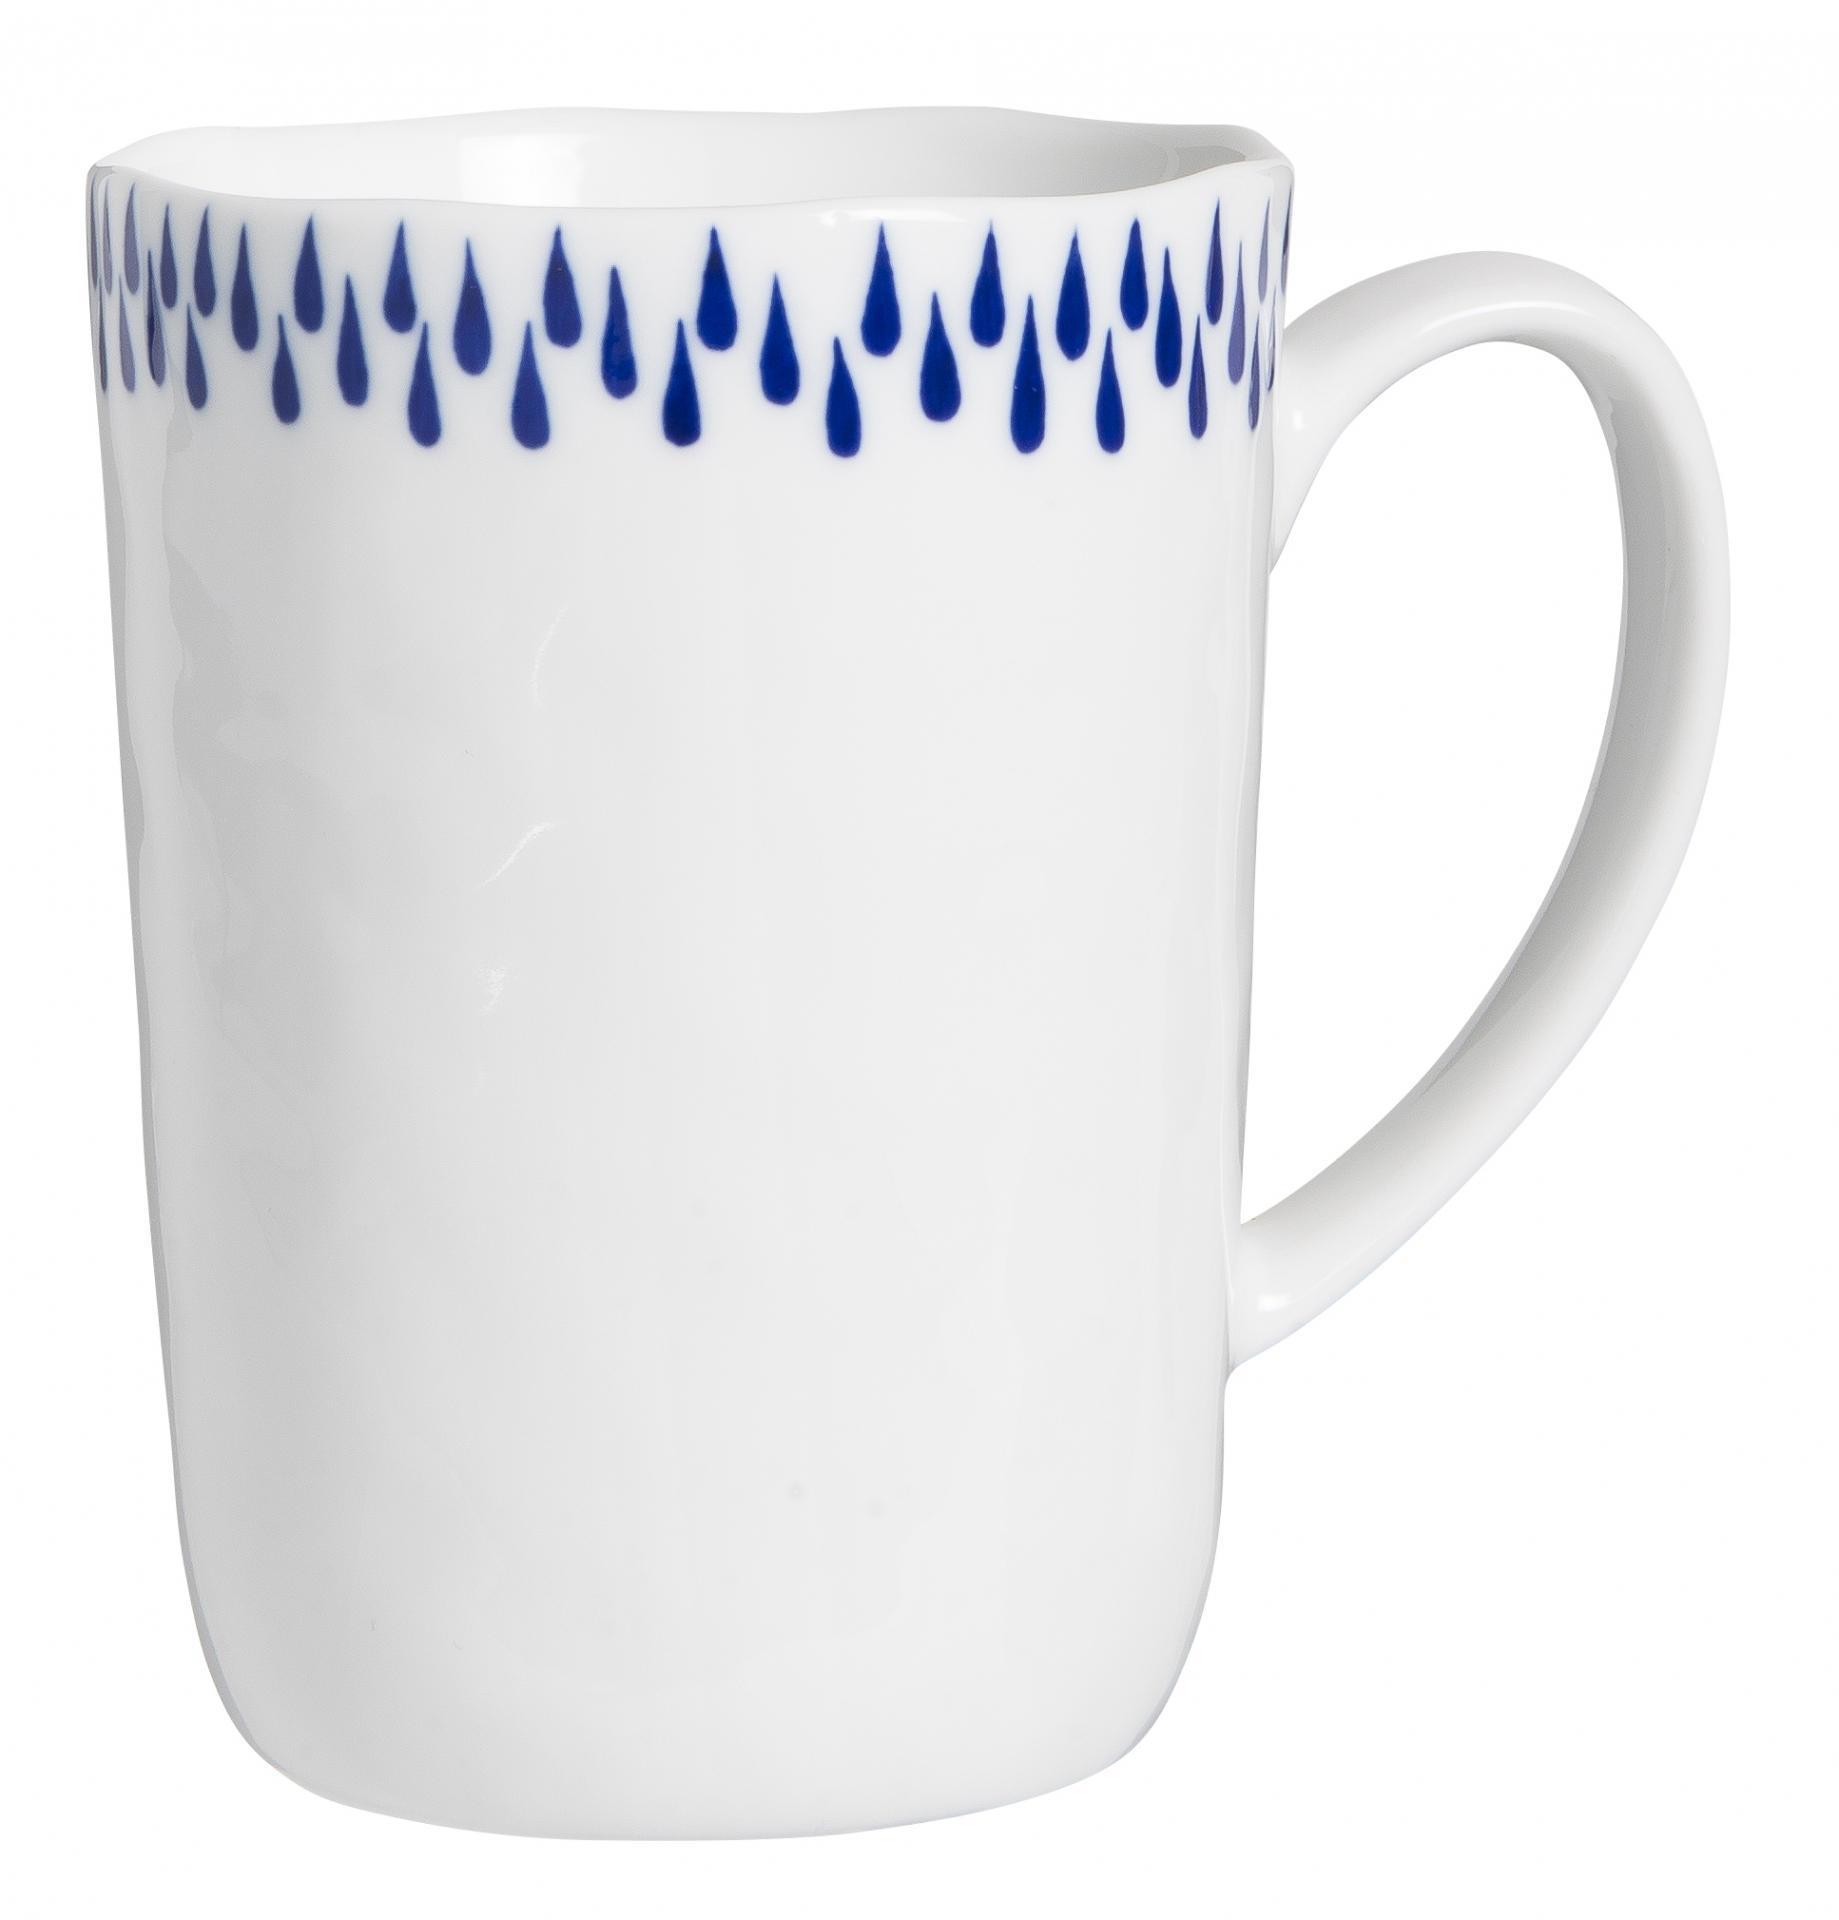 IB LAURSEN Porcelánový hrneček Delicate Blue 320ml, modrá barva, bílá barva, porcelán